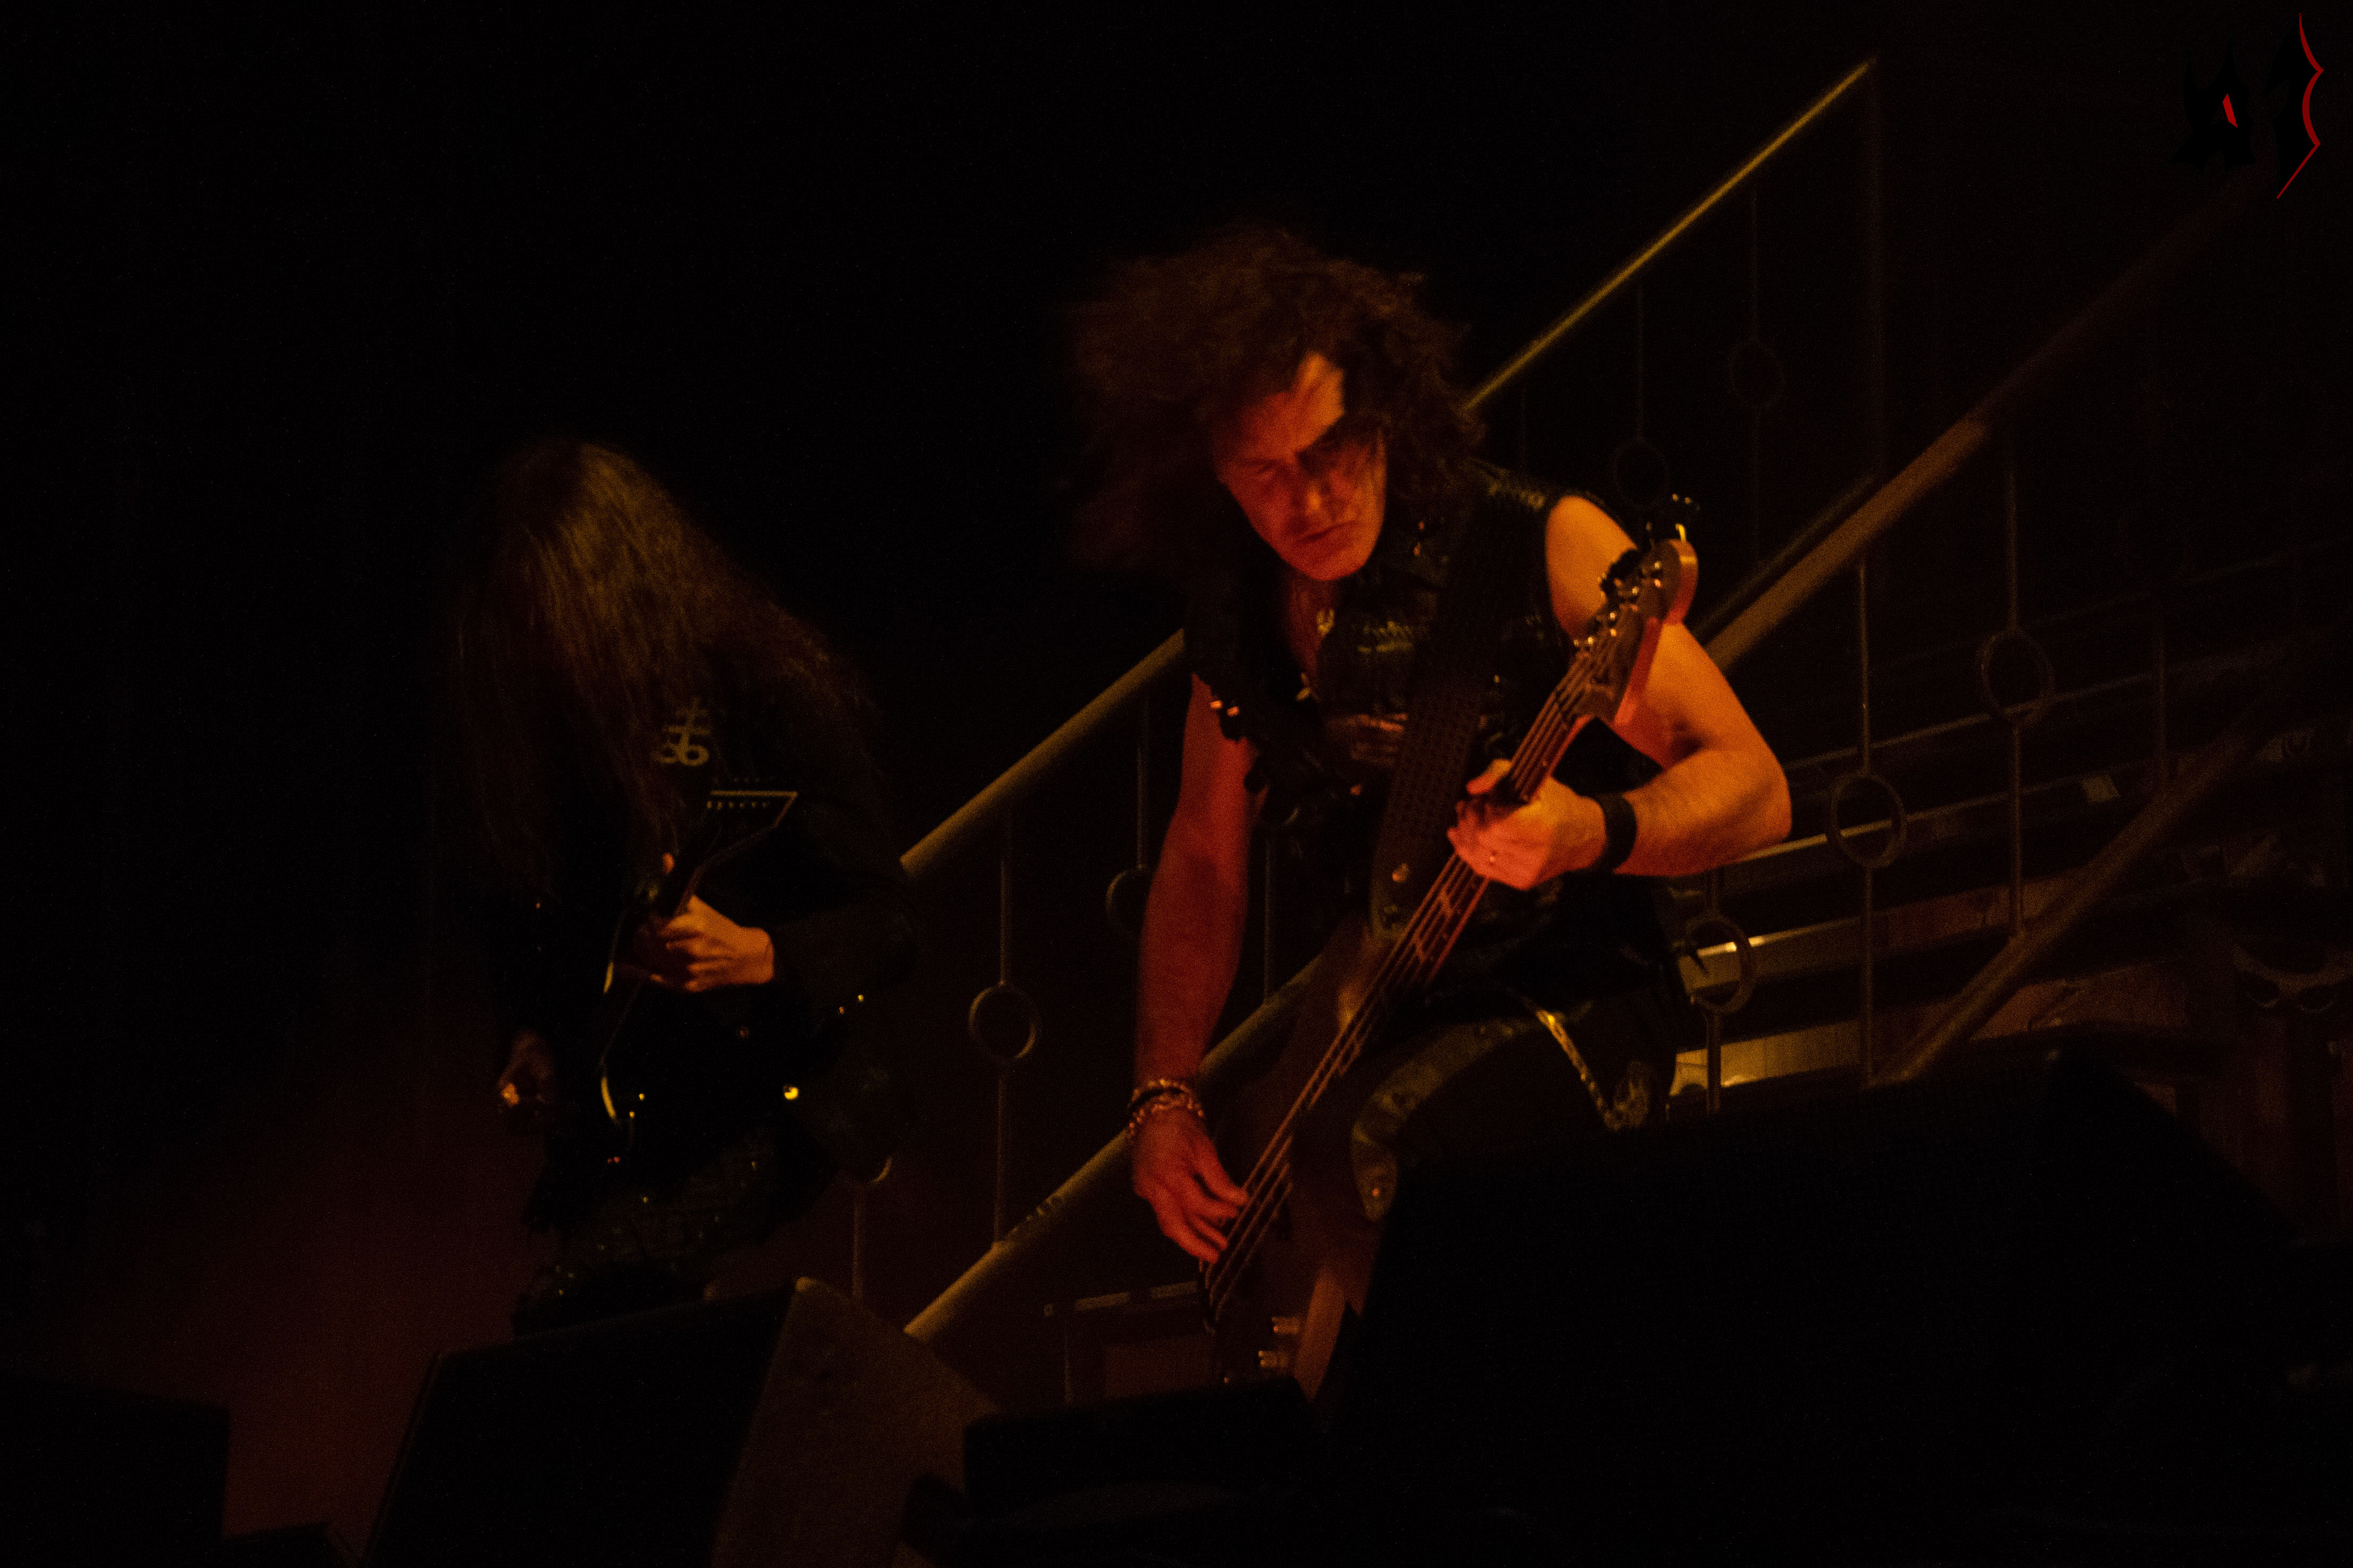 Hellfest - King Diamond - 6